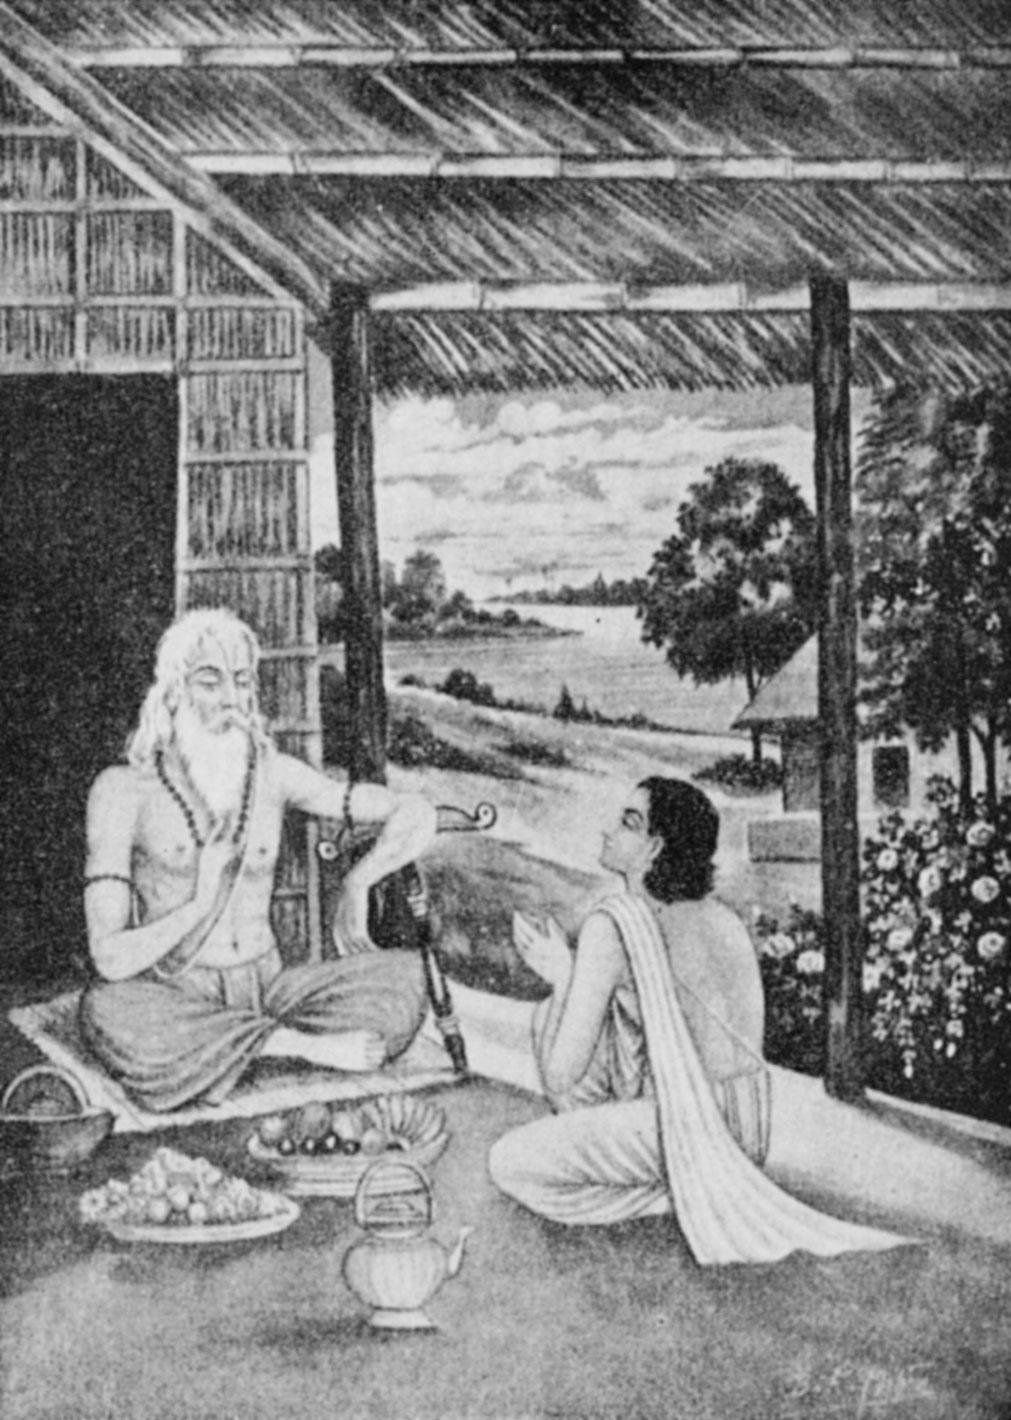 Autobiography of a Yogi, by Paramhansa Yogananda - Free